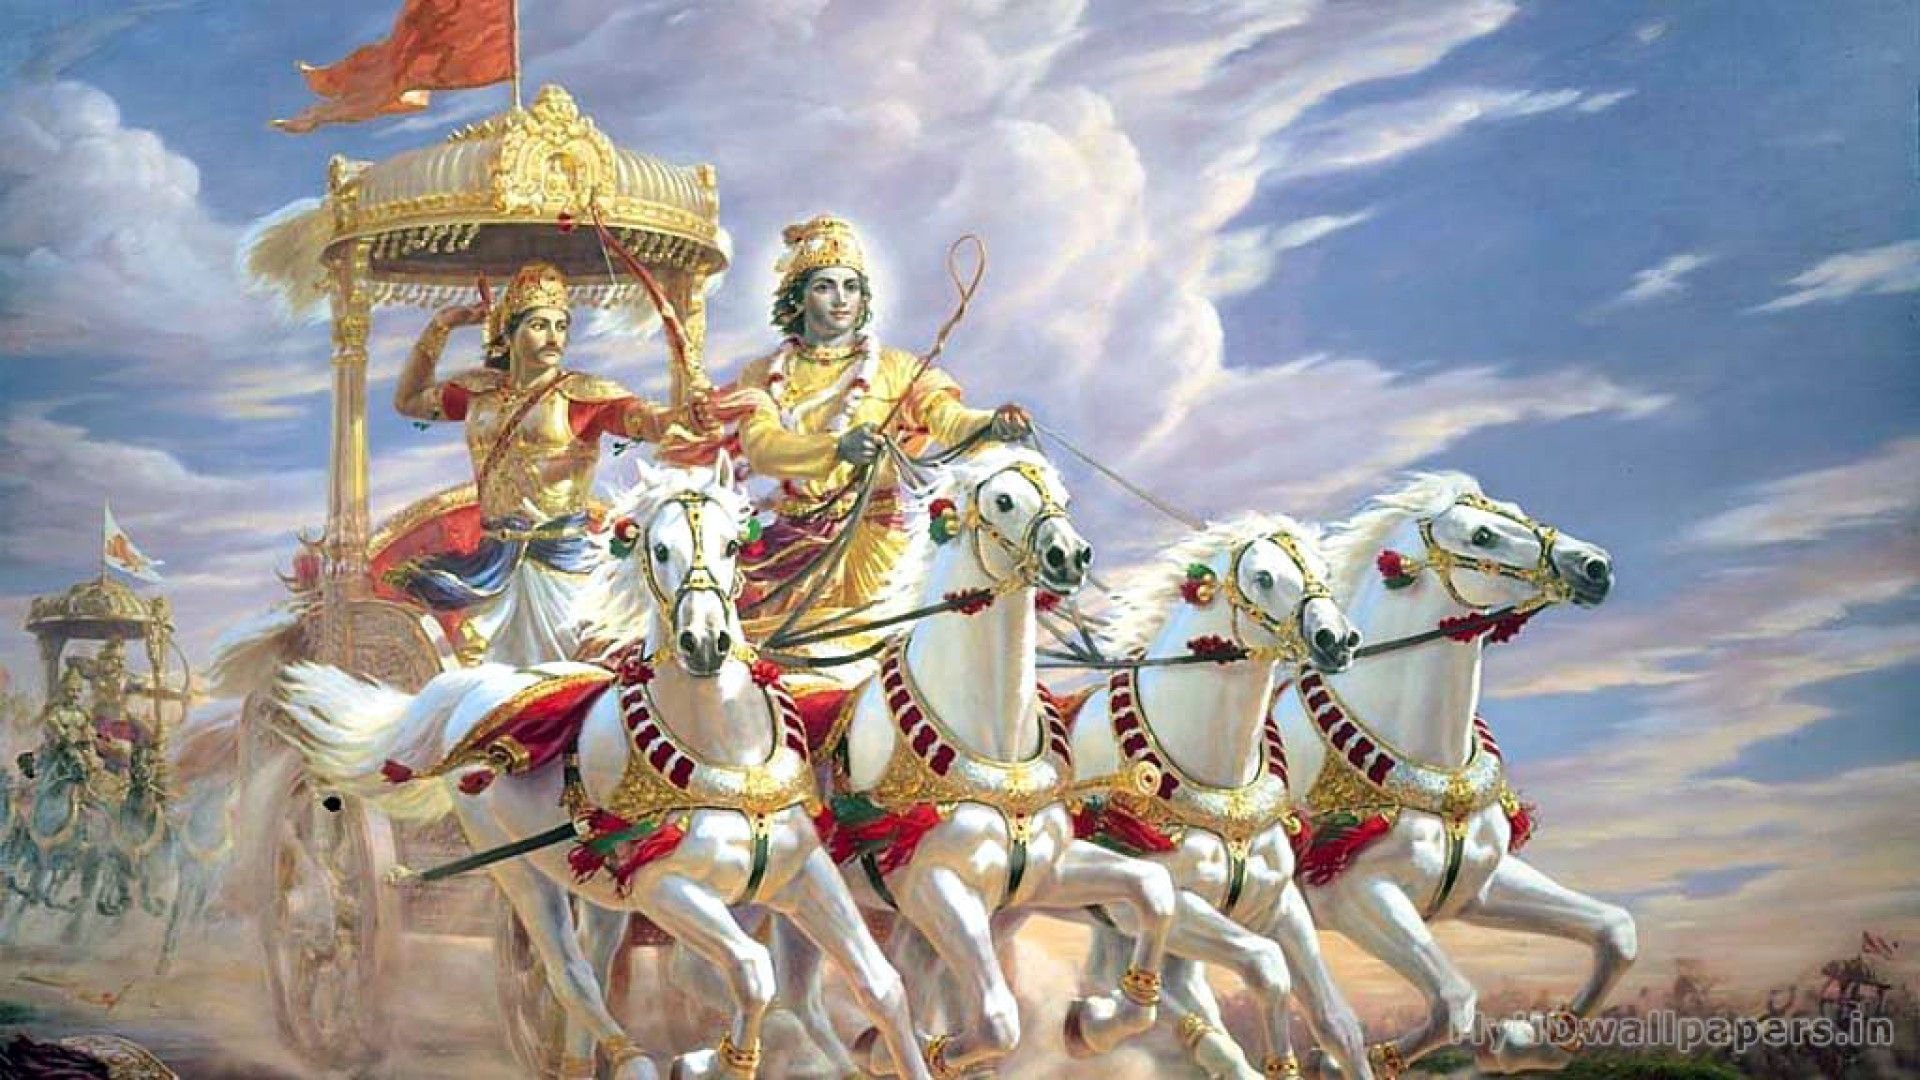 Click Here To Download In Hd Format Mahabharat Wallpaper Desktop Hd Http Www Superwallpapers In Wallpaper M Bhagavad Gita The Mahabharata Krishna